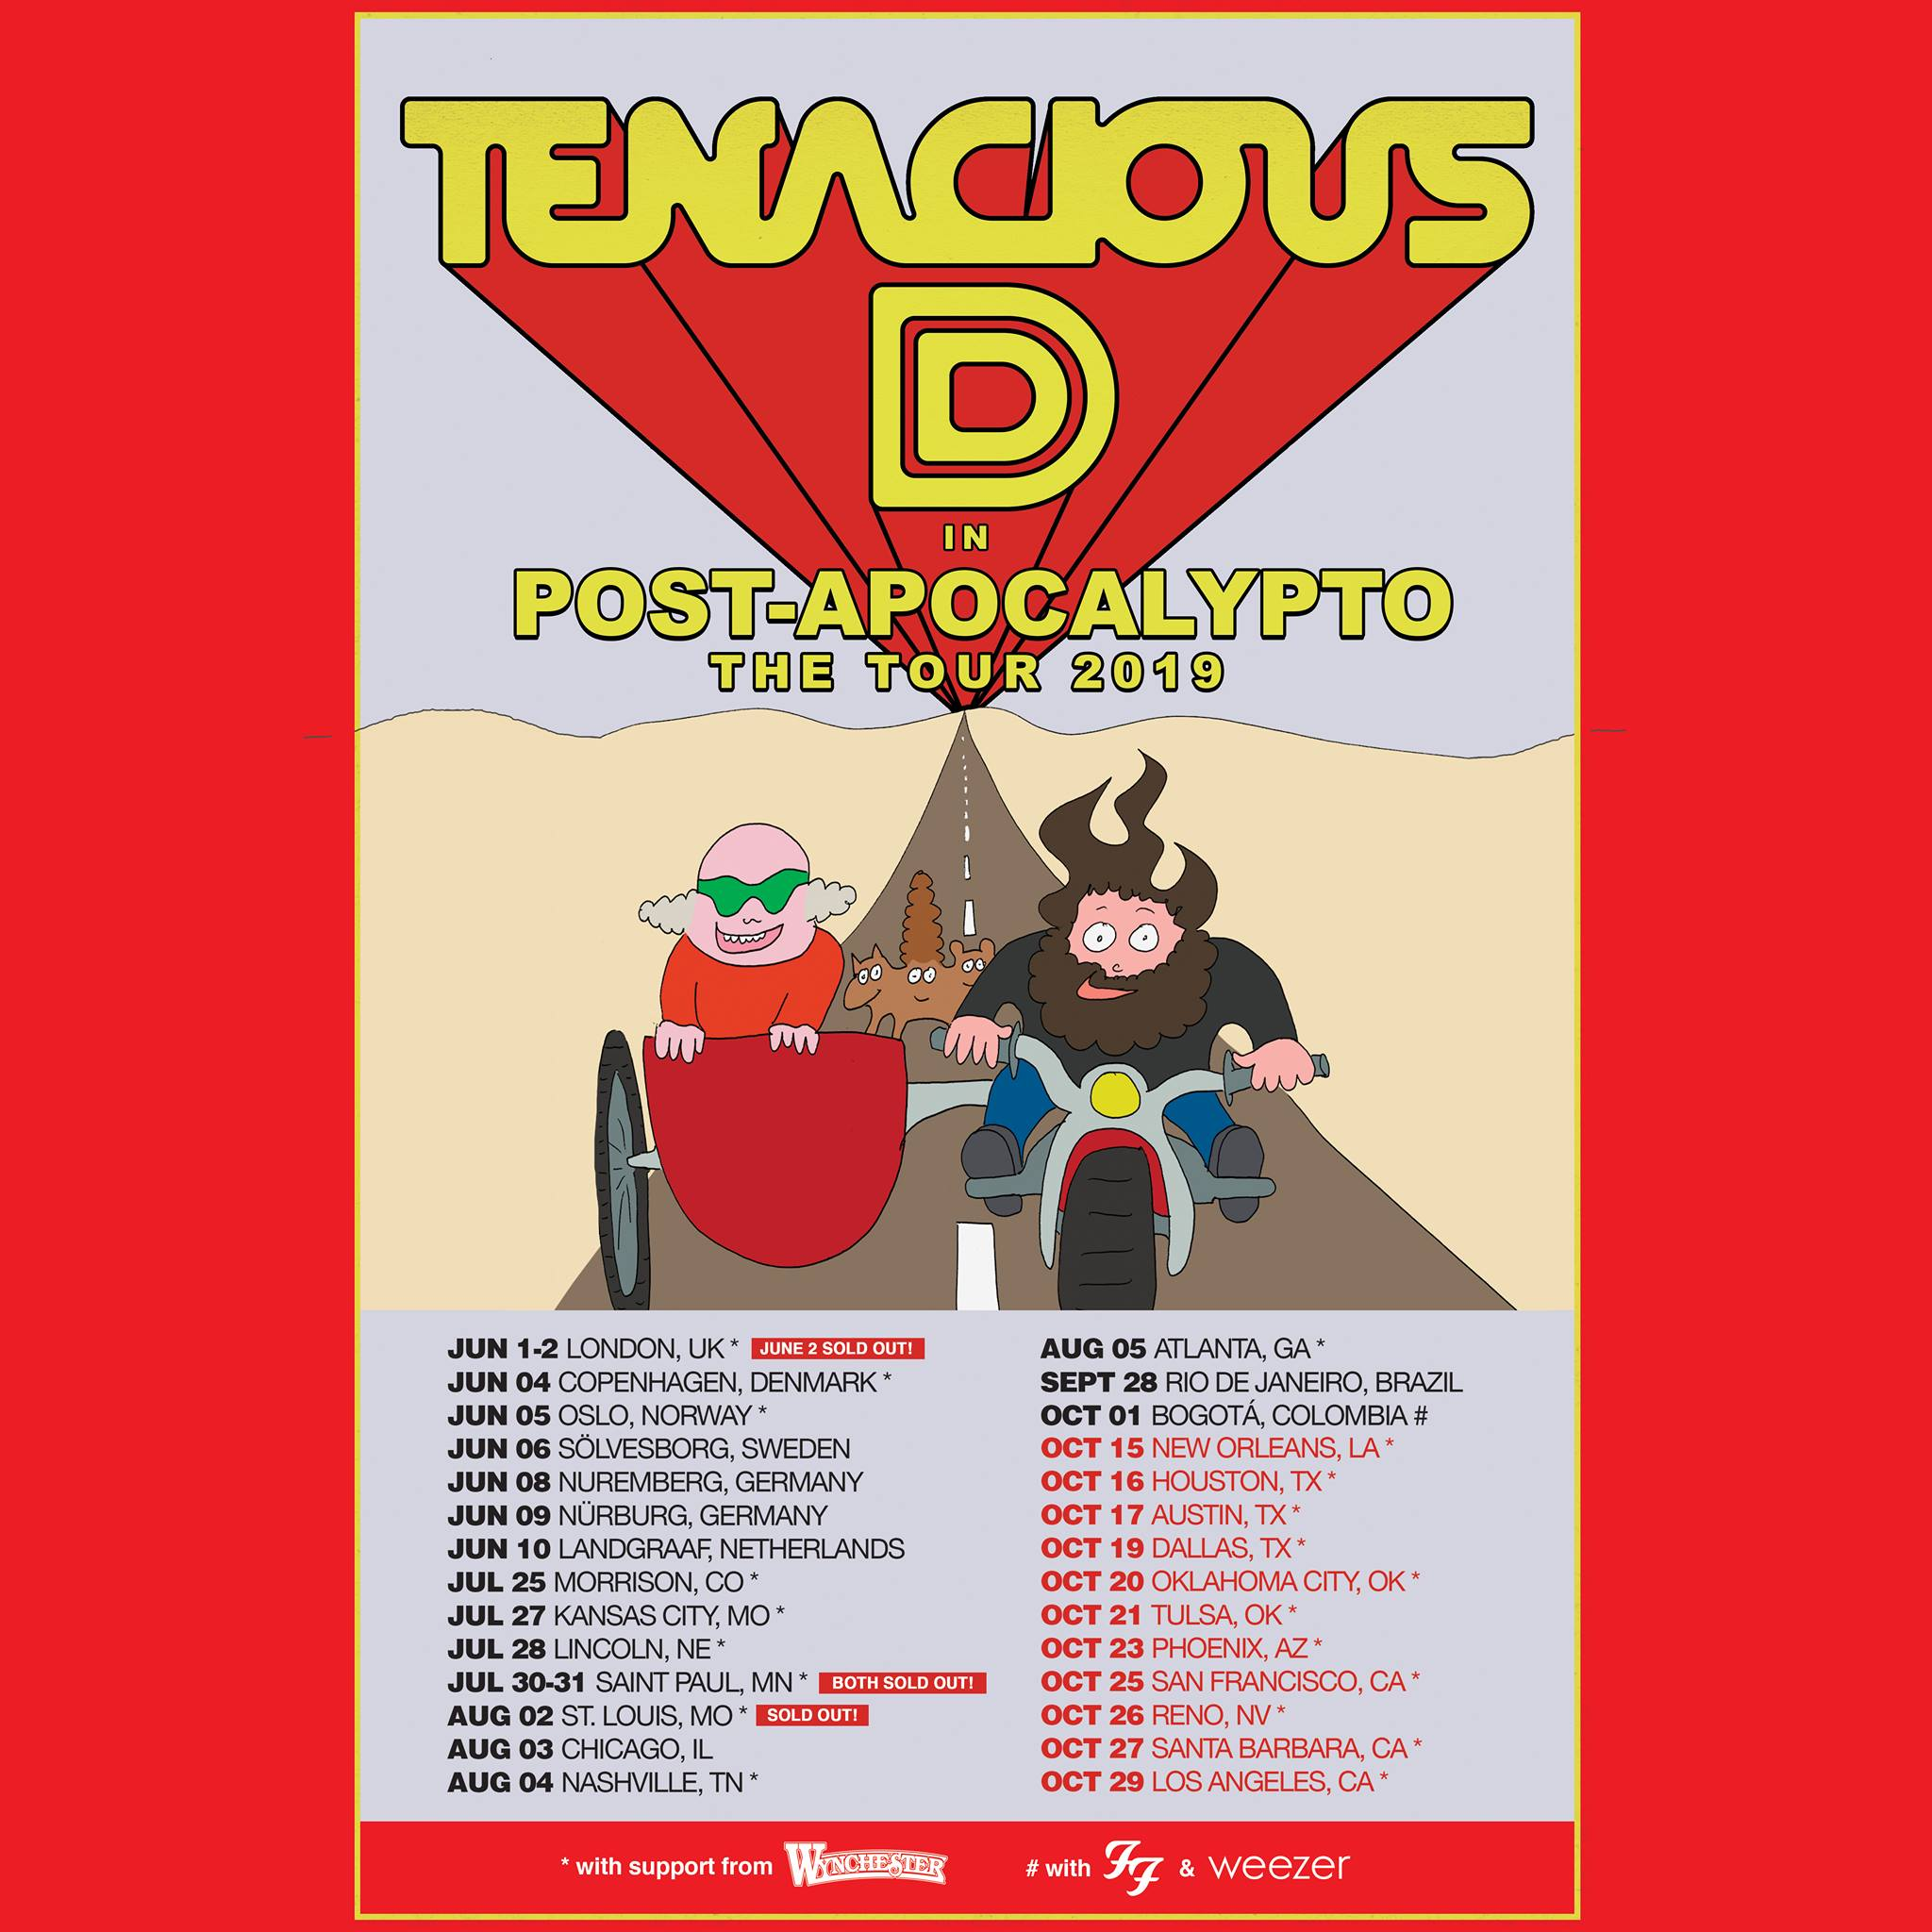 Tenacious D Announces 2019 Fall Tour Dates